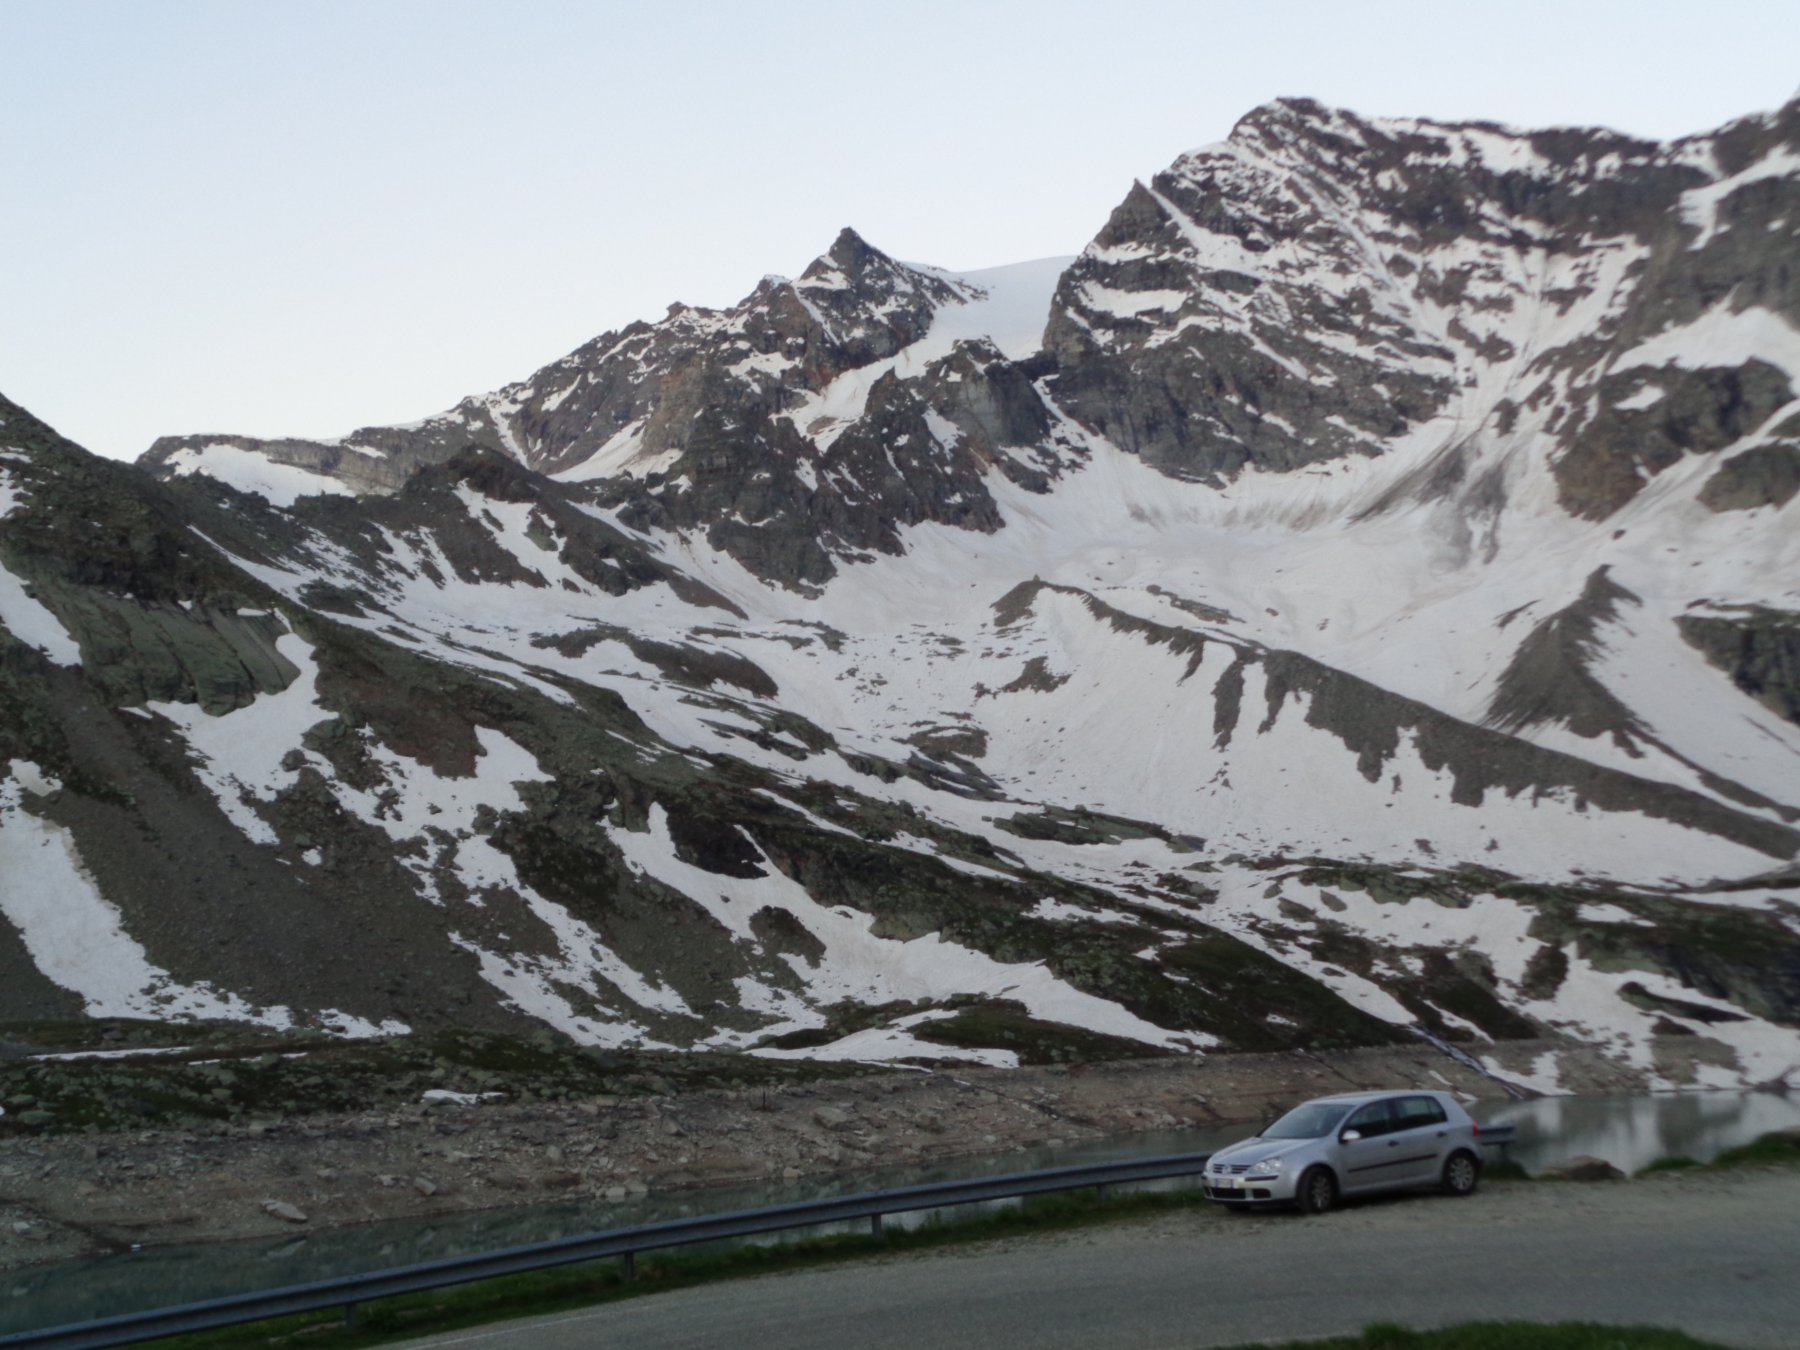 Galisia (Punta) dalla Diga del Serrù, giro valli Orco, Rhemes e Isère 2016-06-24